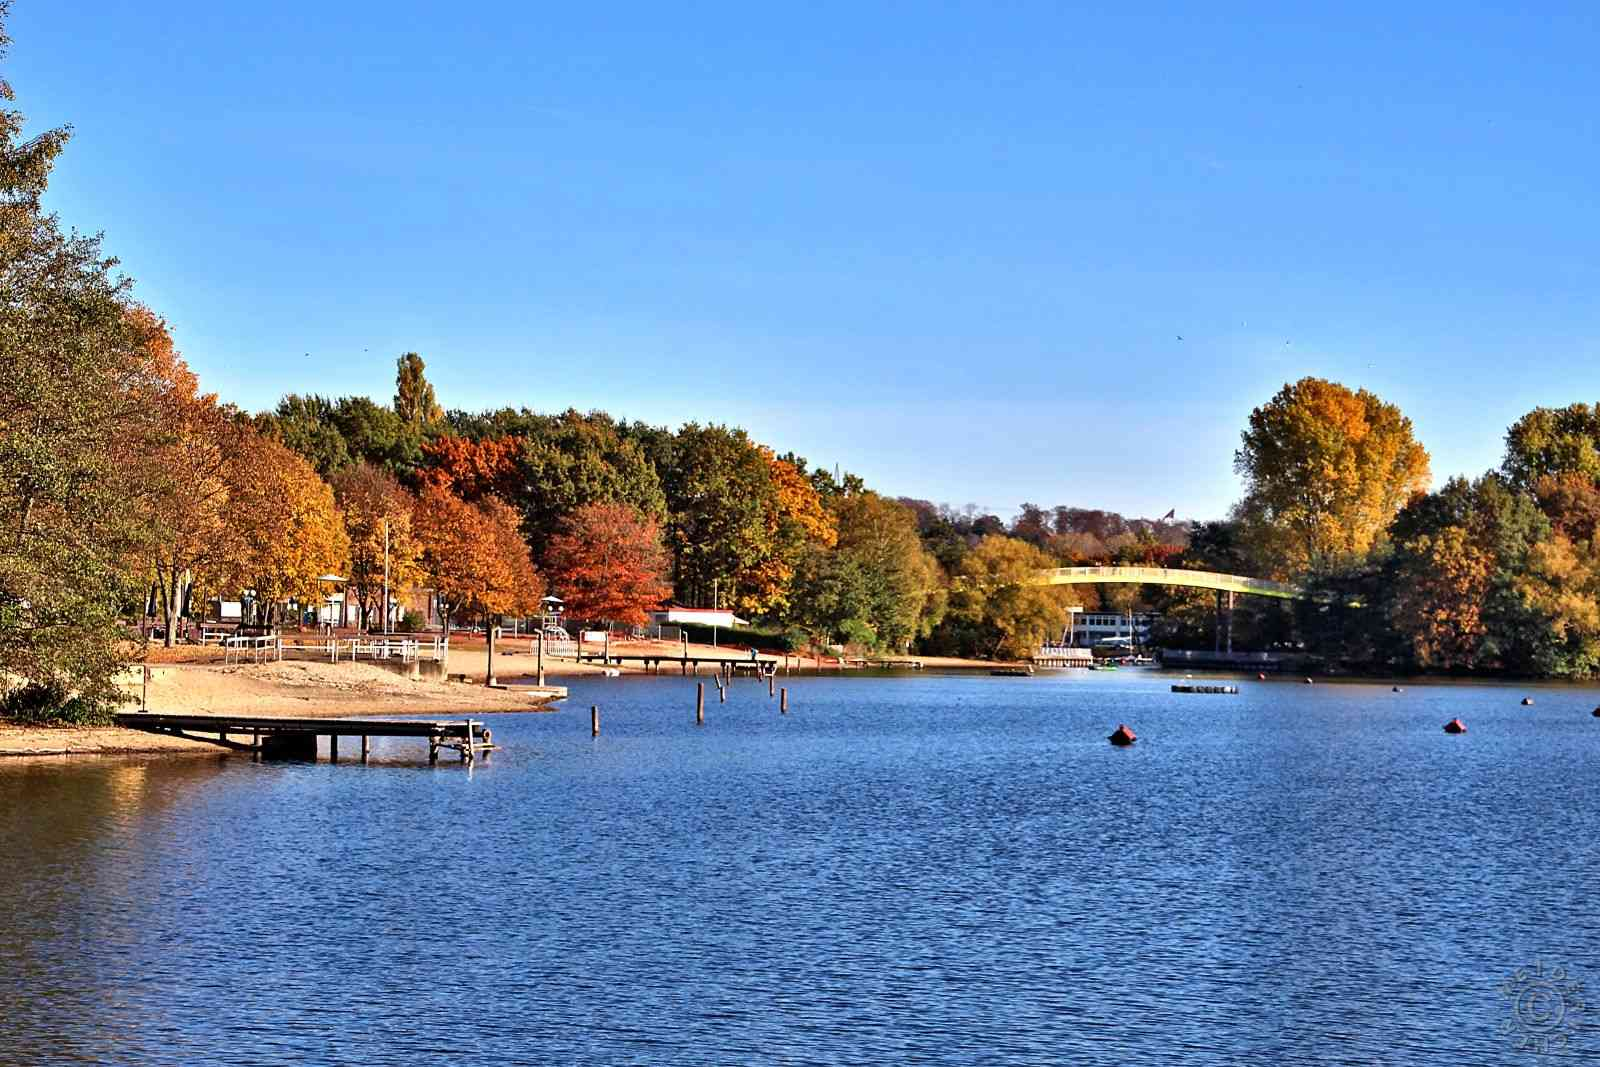 Herbstimpressionen: Sechs Seen Platte 010